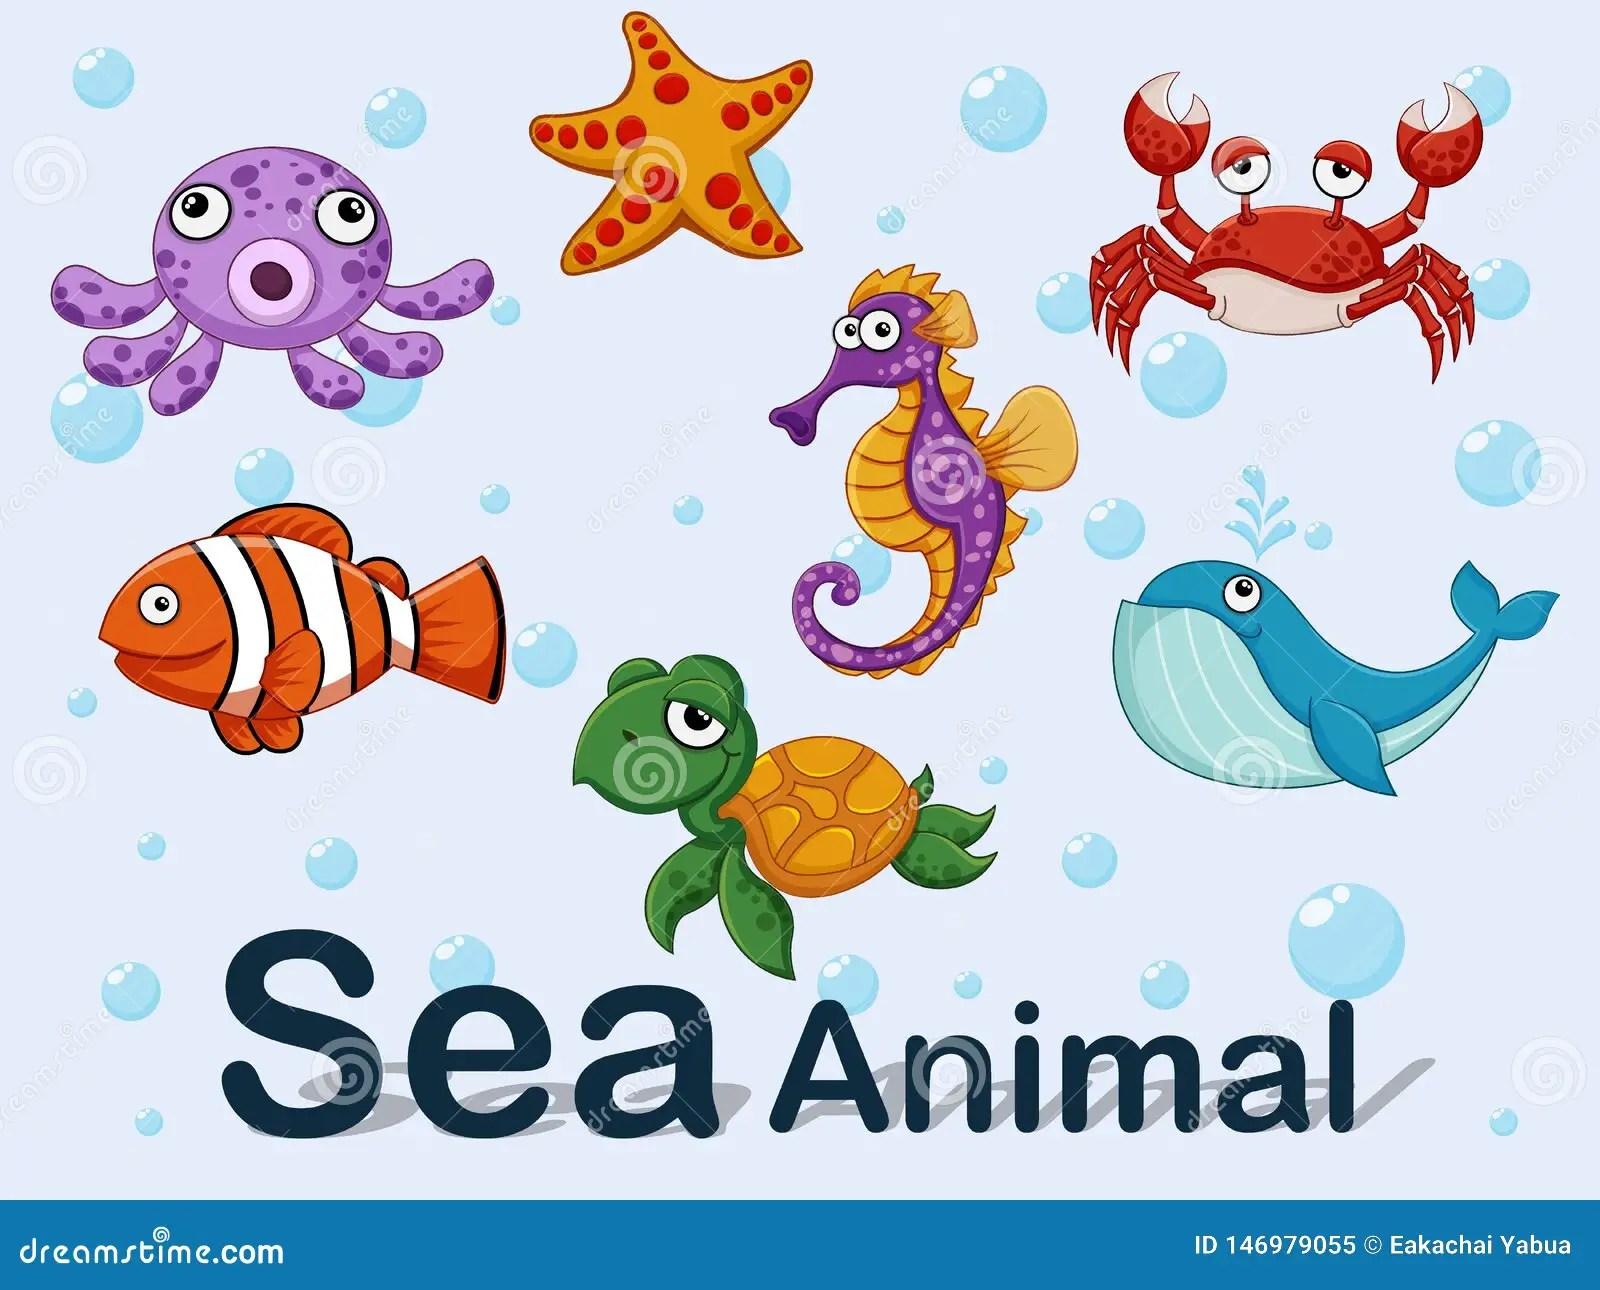 Cute Cartoon Sea Animals Underwater Vector Illustration Set Of Collection Sea Creatures Stock Vector Illustration Of Comic Collection 146979055